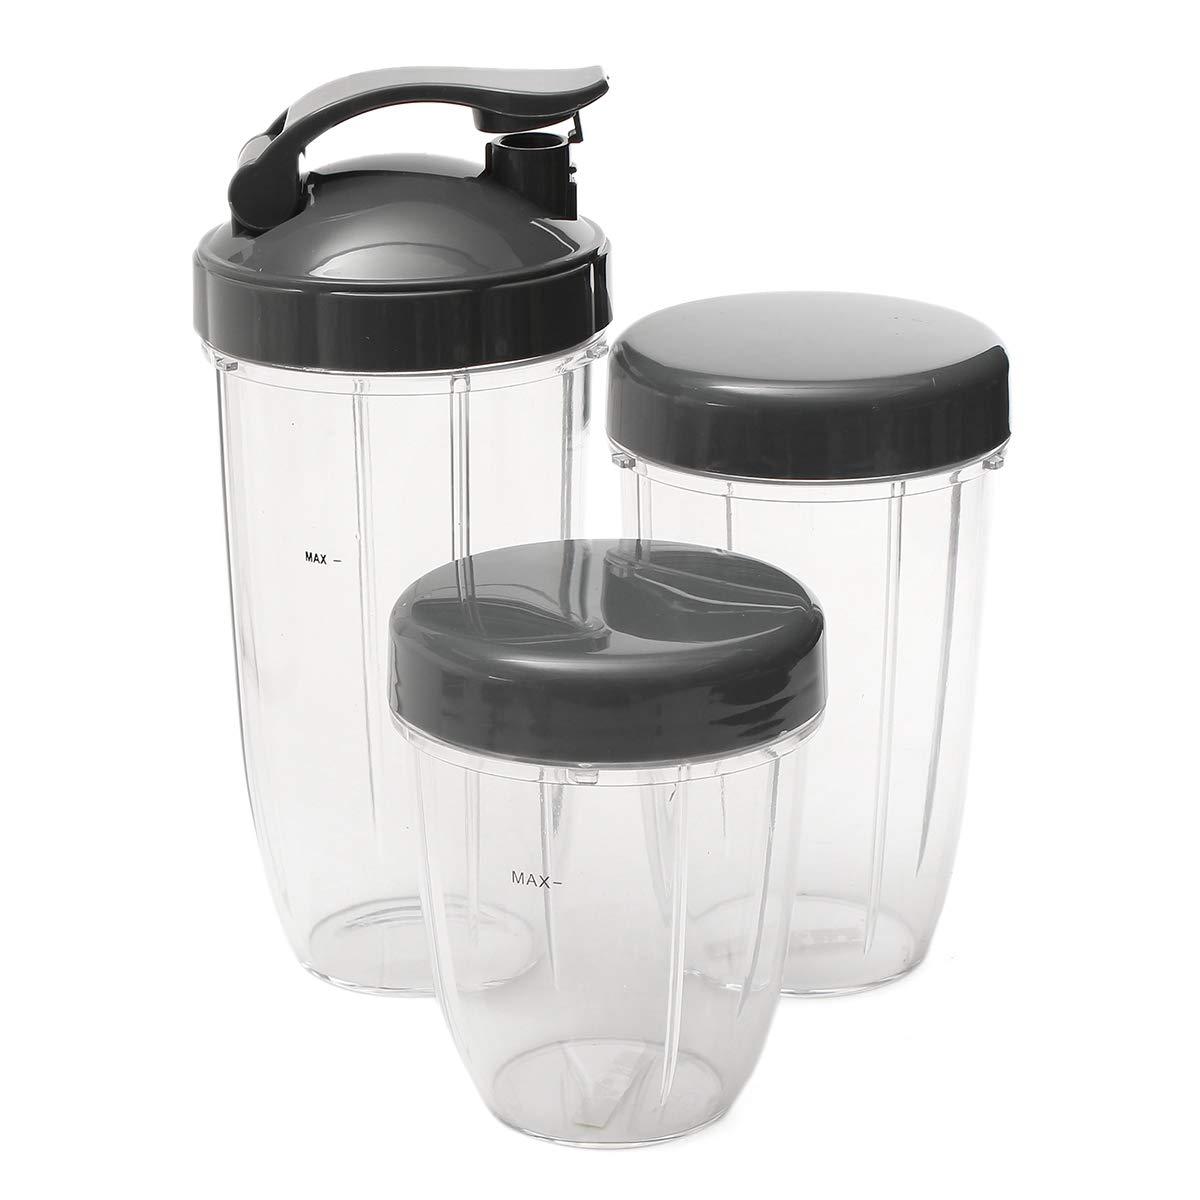 18oz Small Cup+3 Lids For Nutribullet Fruit Juicer Parts Kitchen Appliance Bottle 24 Oz Tall Noblik 3Pcs Replacement Cups 32 Oz Colossal